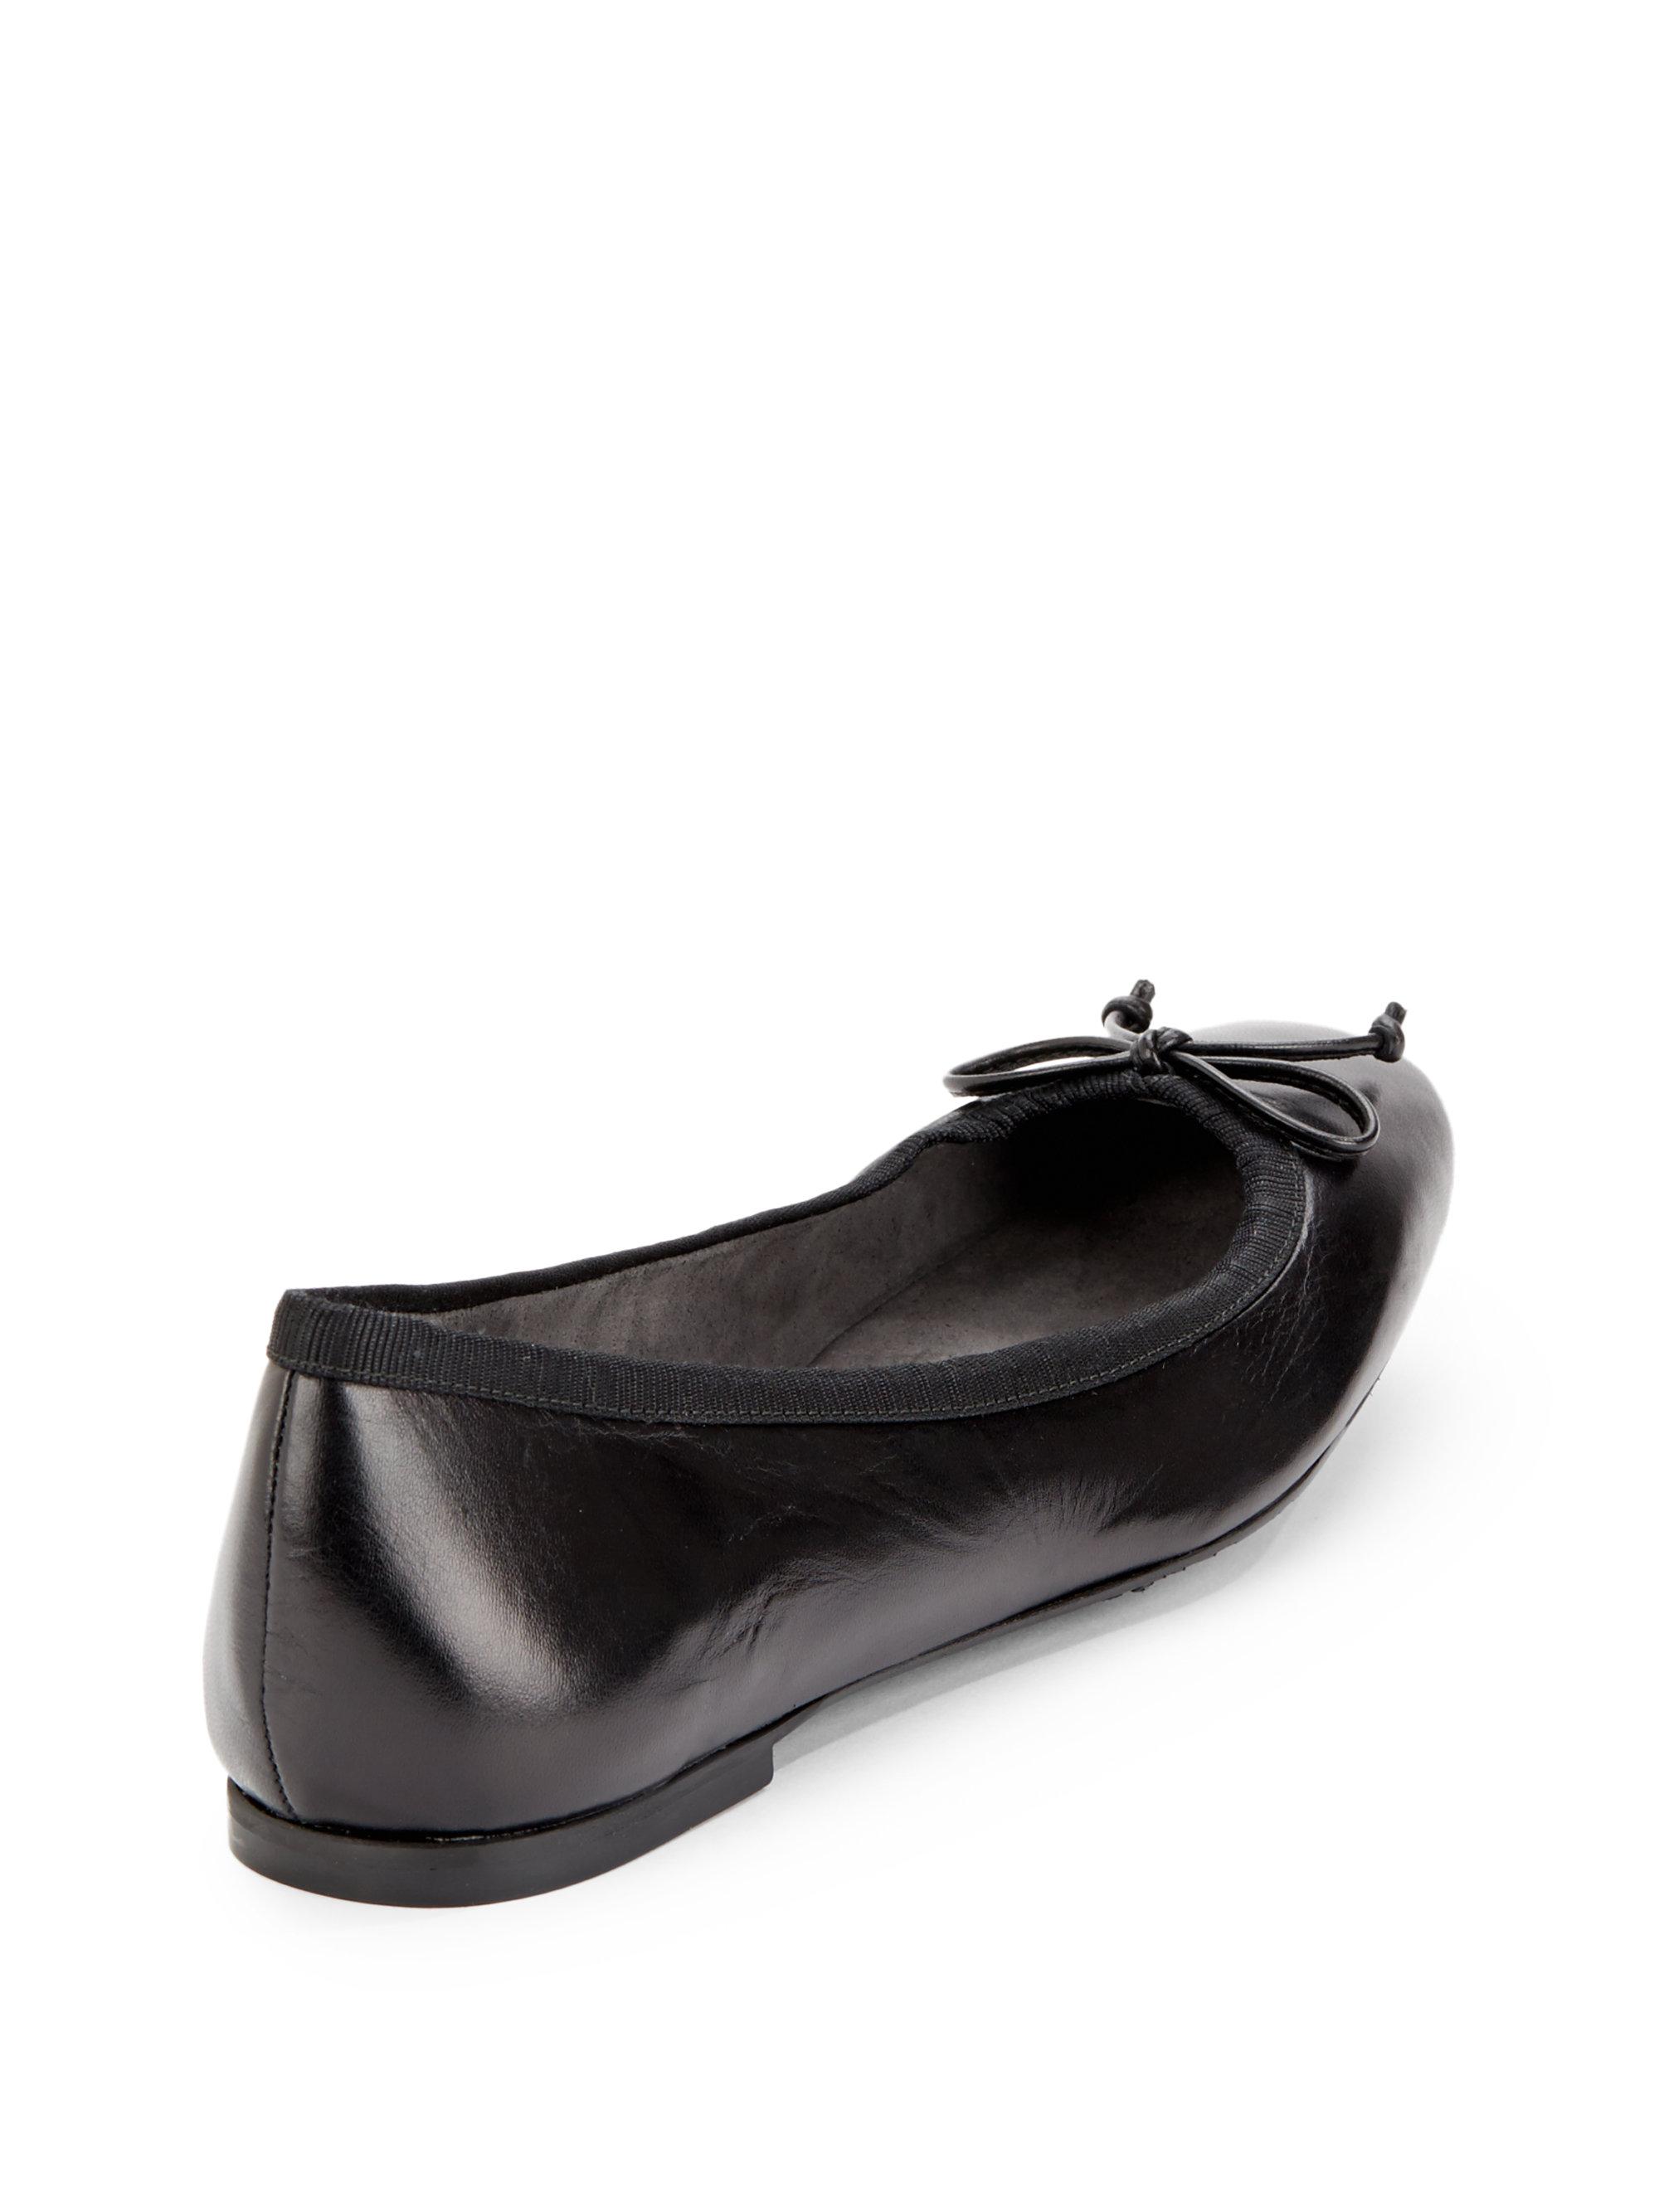 d2711183781 Lyst - Stuart Weitzman Shoestring Leather Ballet Flats in Black